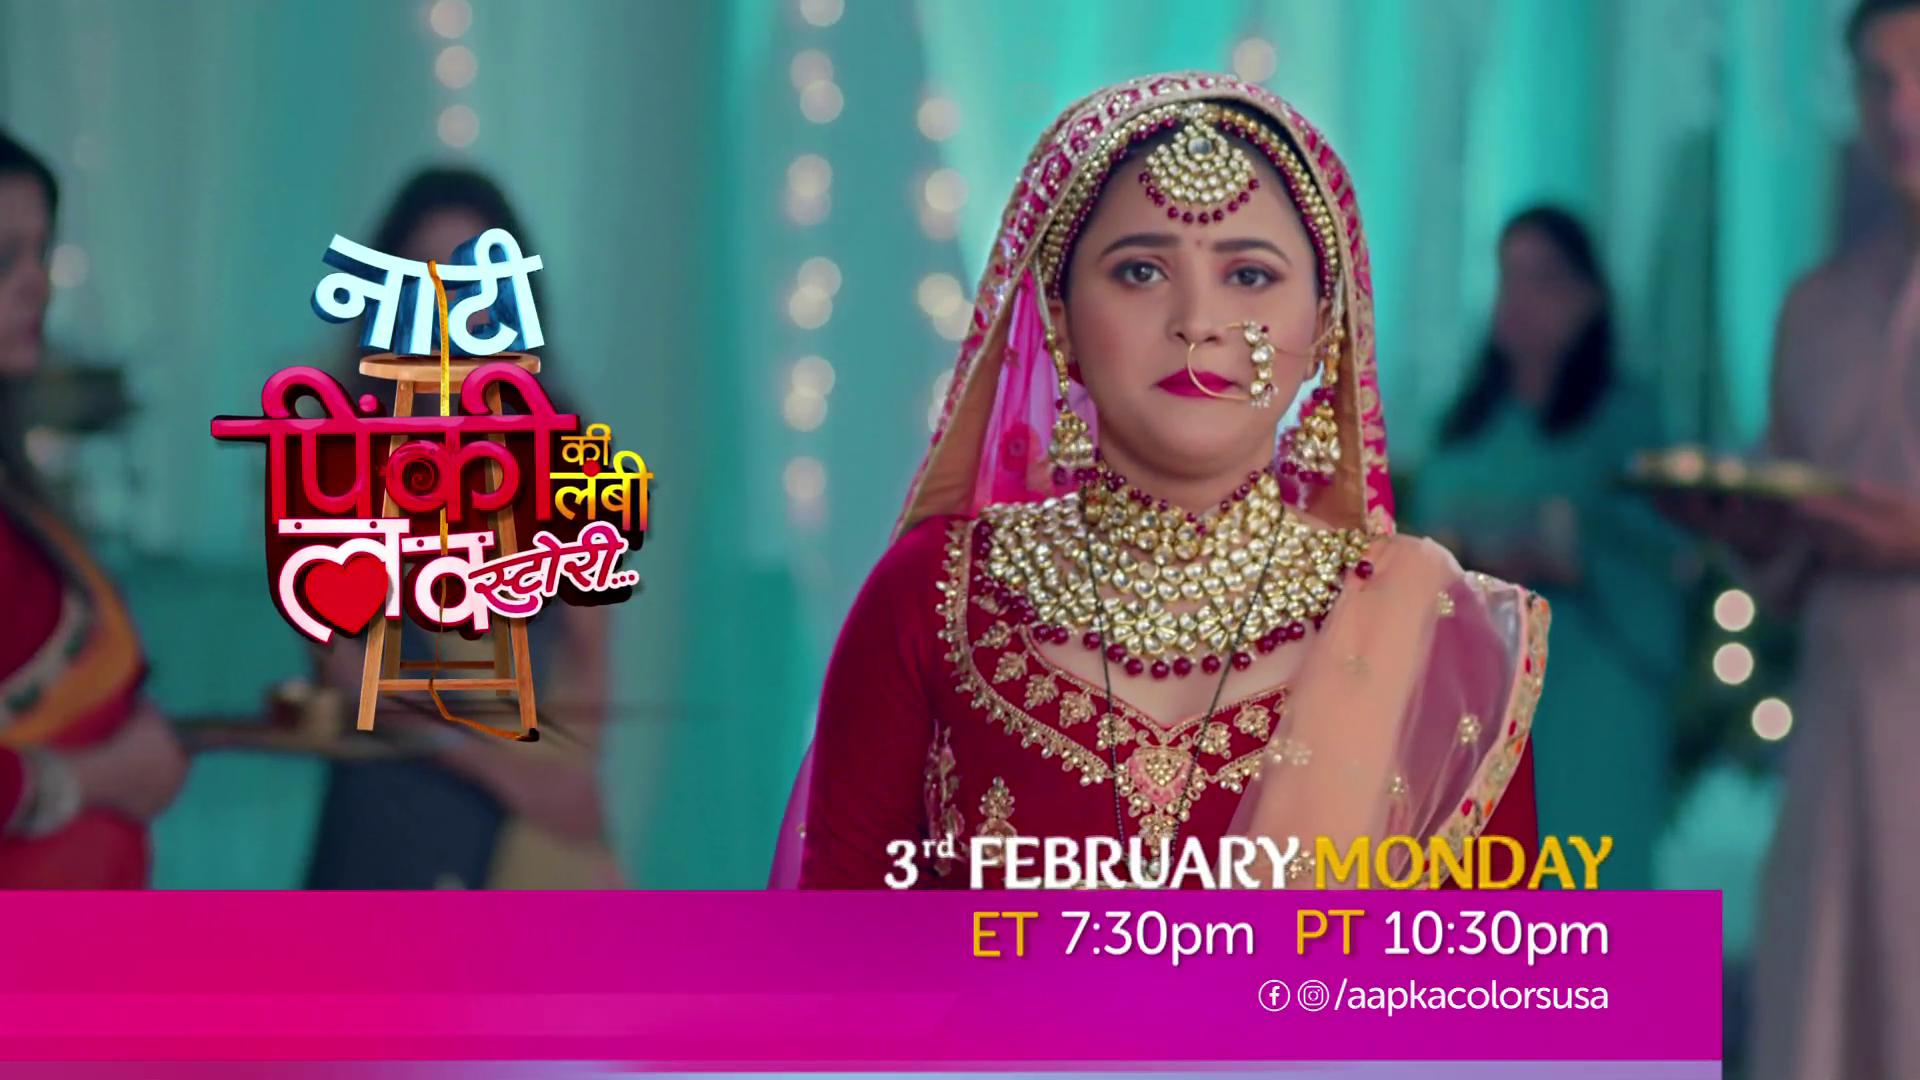 Watch Naati Pinky Mon-Fri at 7:30 pm ET & 10:30 pm PT